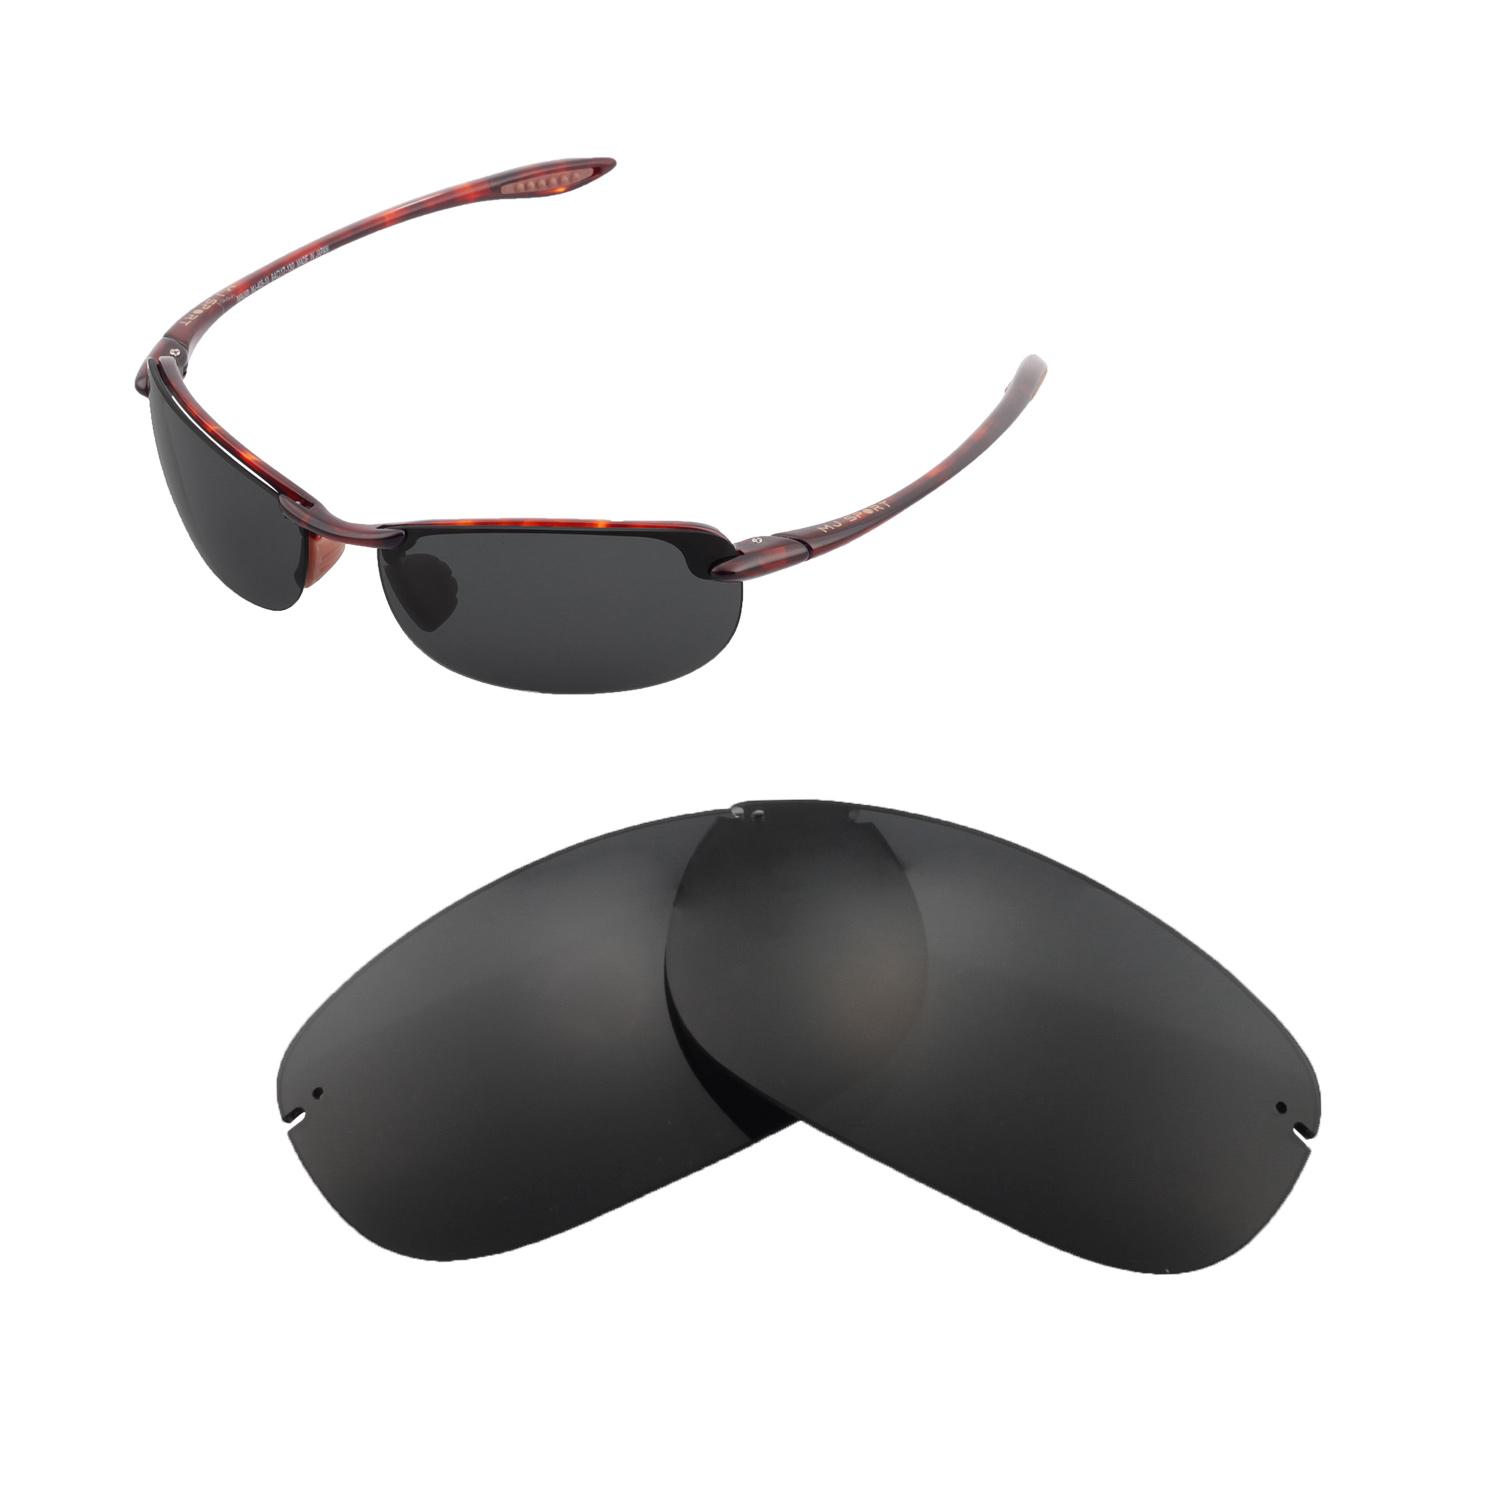 15461c426418 Details about Walleva Polarized Black Replacement Lenses For Maui Jim  Makaha Sunglasses